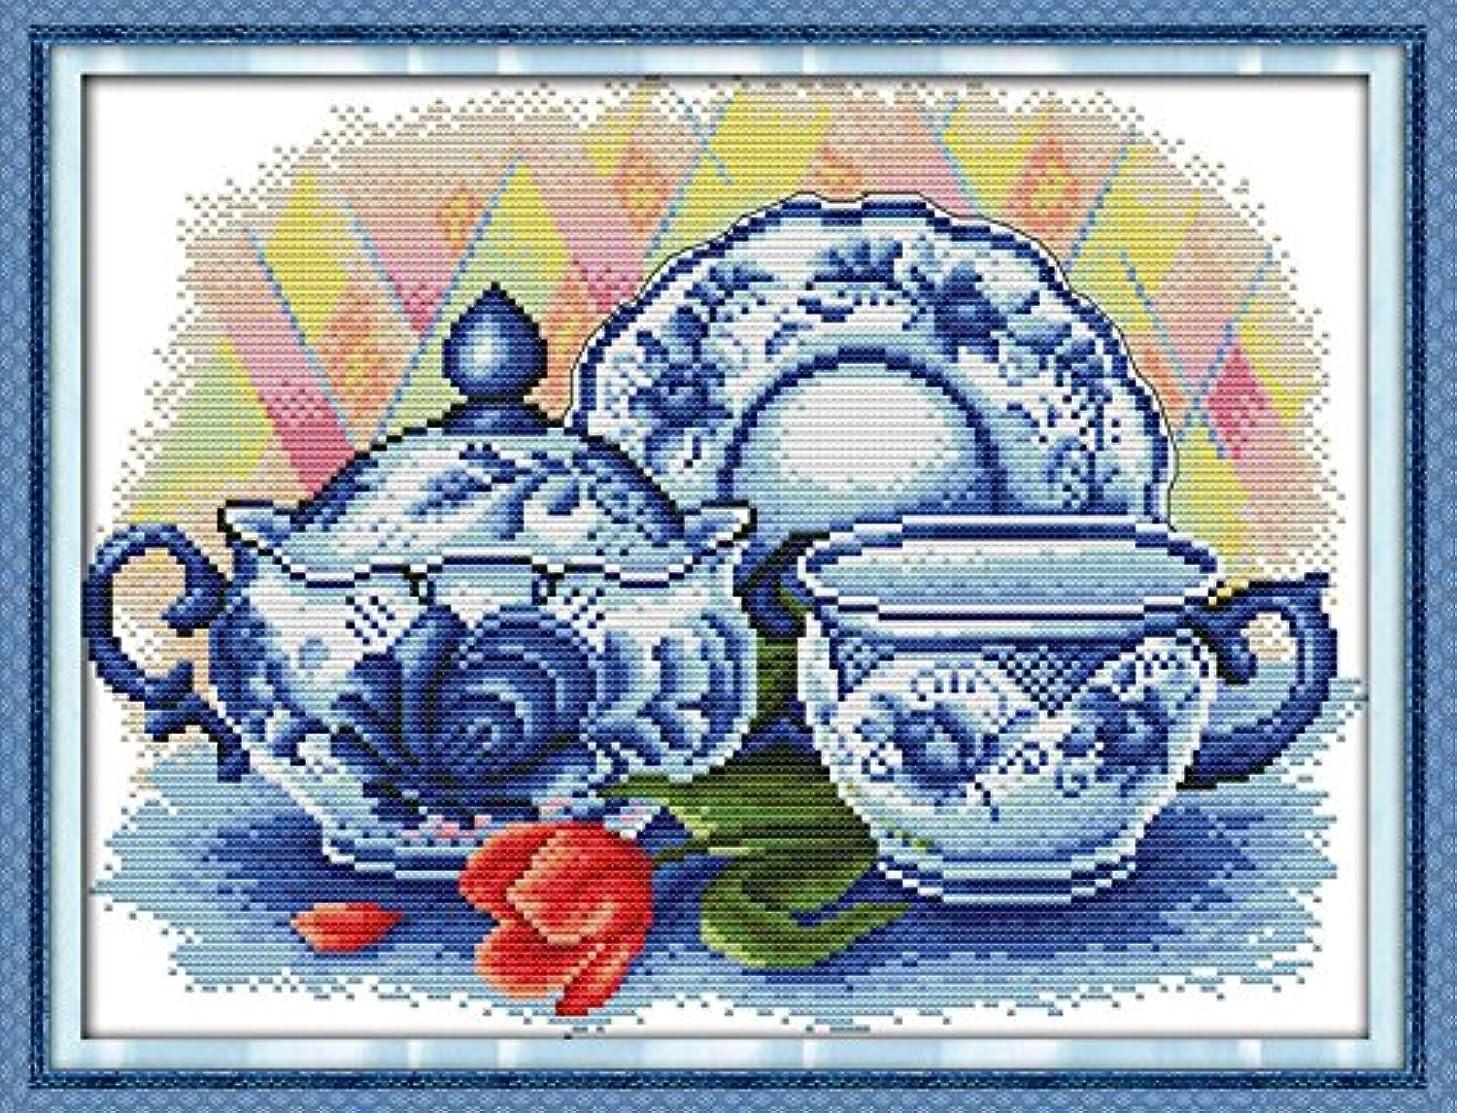 Joy Sunday Cross Stitch Kit 14CT Stamped Embroidery Kits Precise Printed Needlework- The celadon teapot 36×29CM